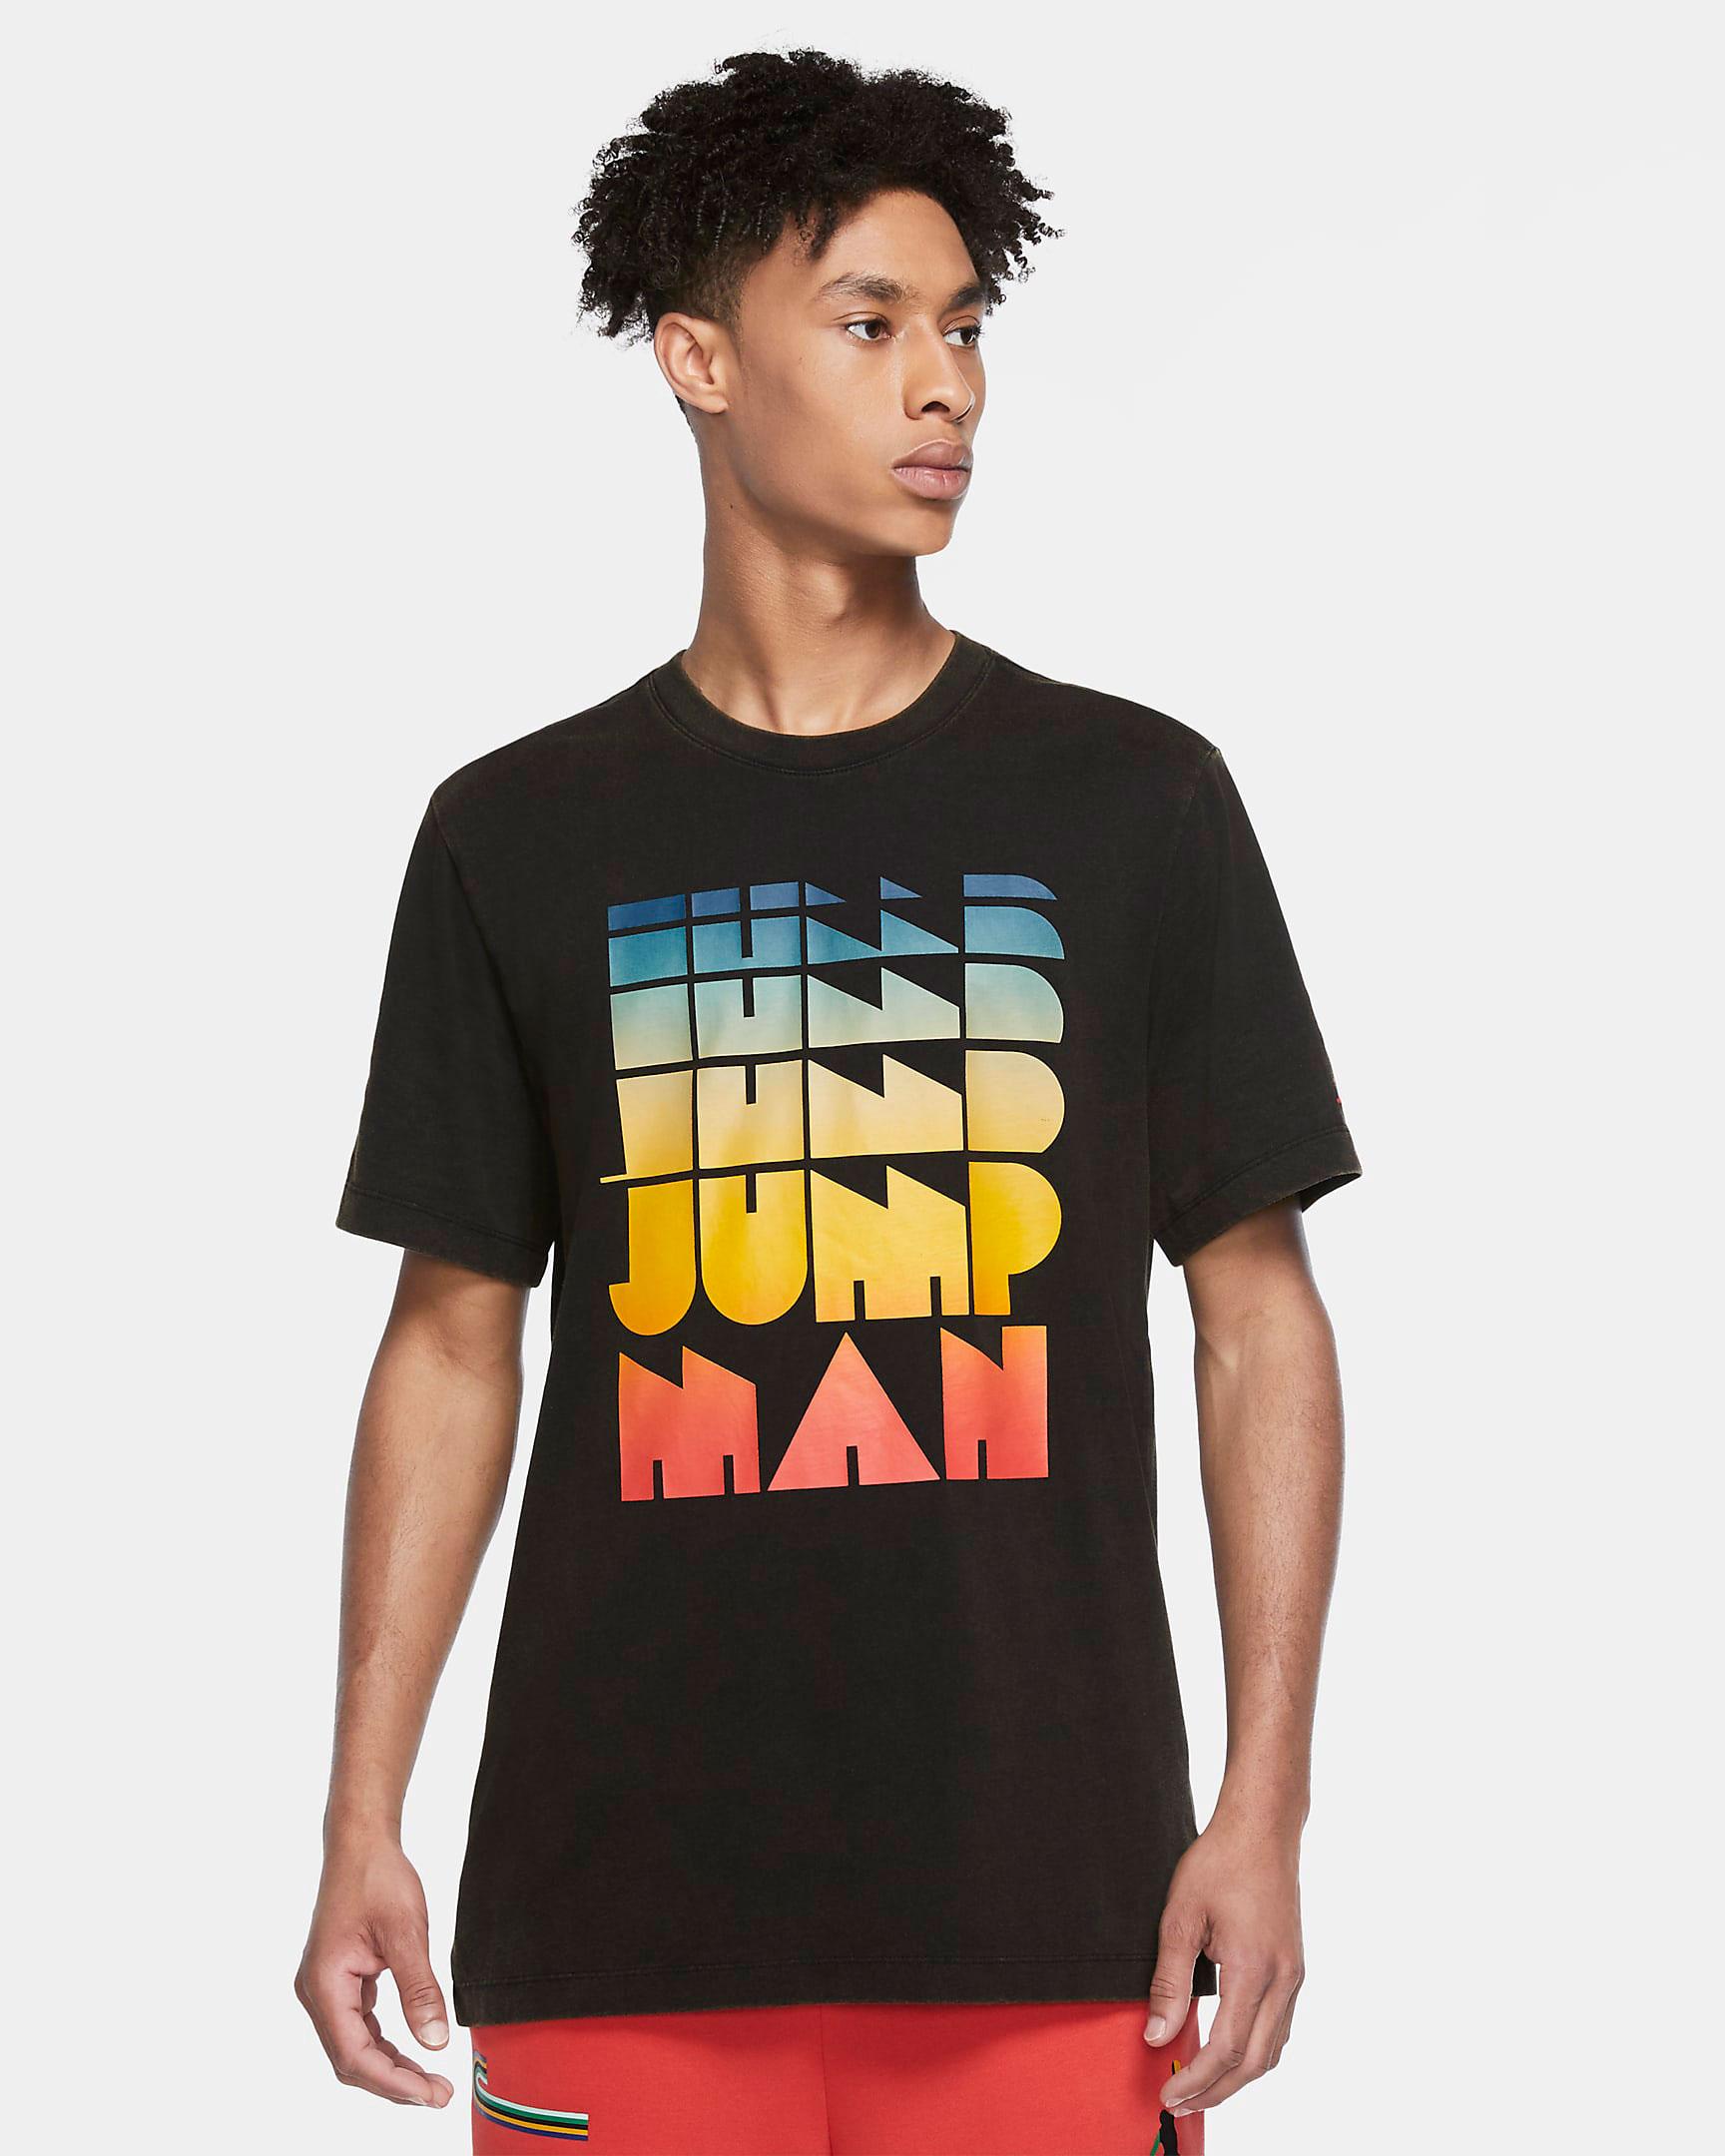 air-jordan-4-union-shirt-match